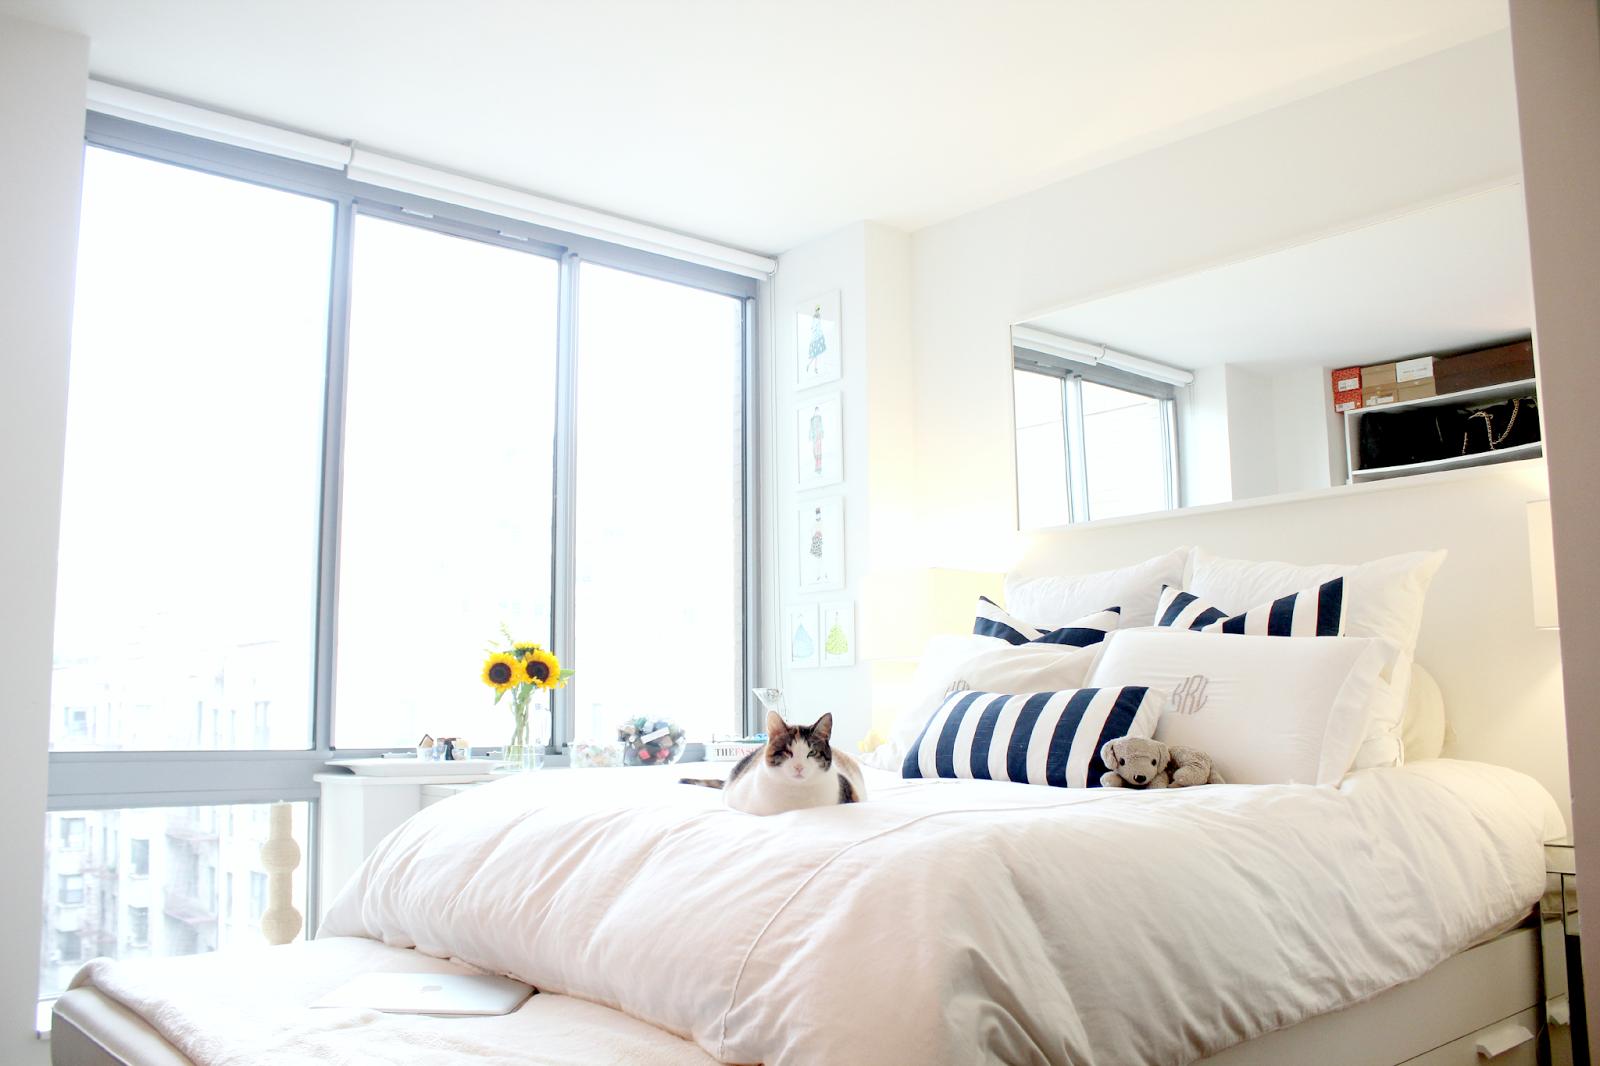 New york city studio apartment tour part 4 the bedroom for Alcove studio